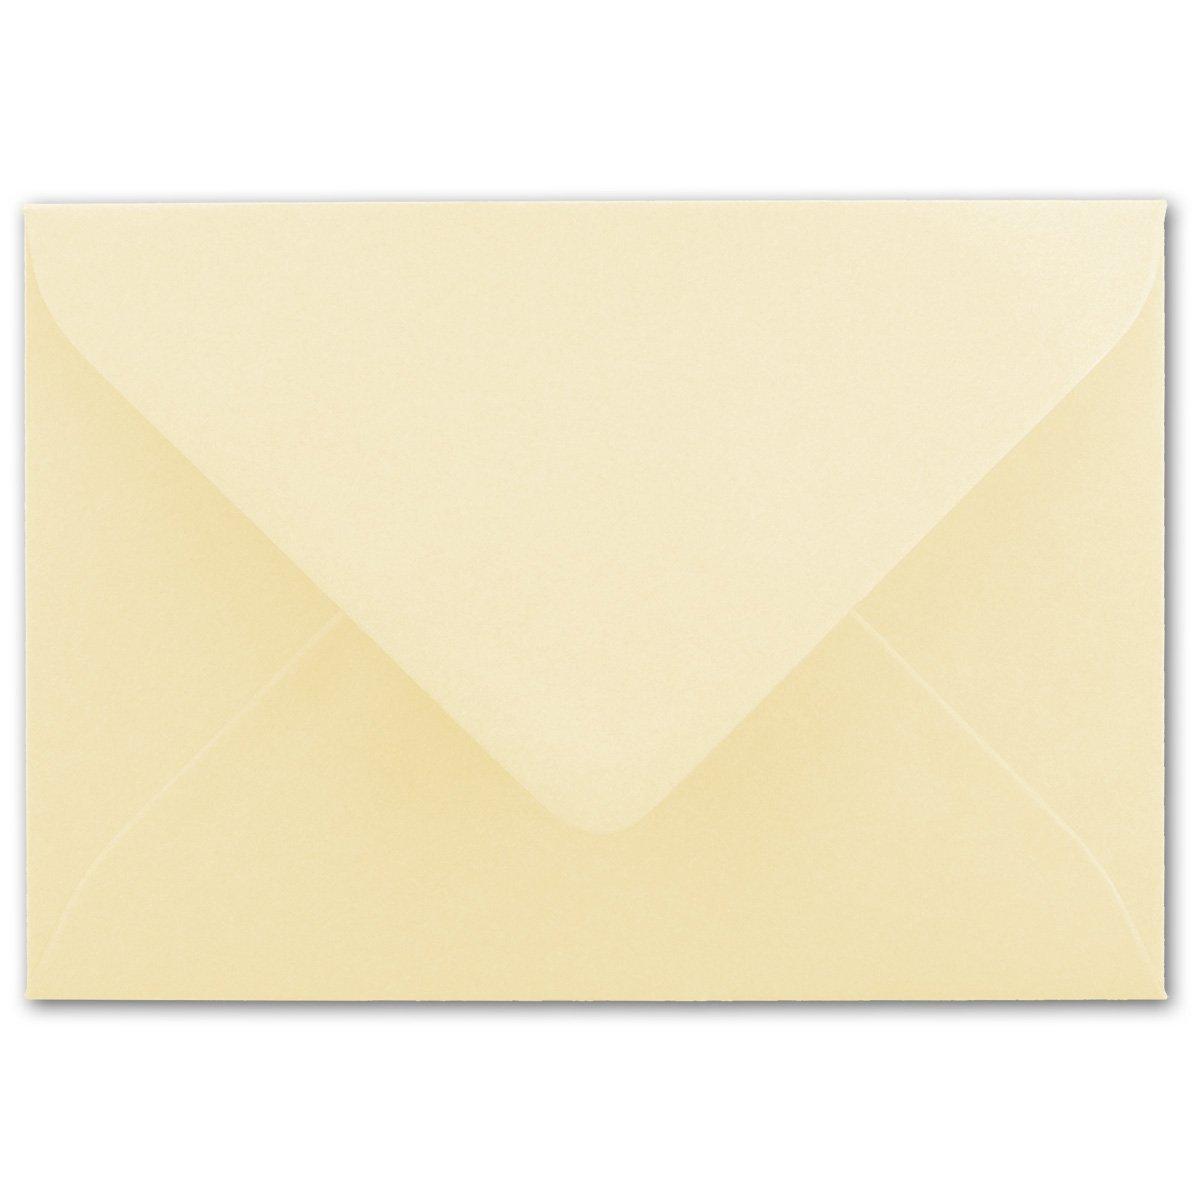 75 Sets - Faltkarten Hellgrau - Din A5 A5 A5  Umschläge Din C5 - Premium Qualität - Sehr formstabil - Qualitätsmarke  NEUSER FarbenFroh B07BSHVDWK Kartenkartons Qualität 55d0c3